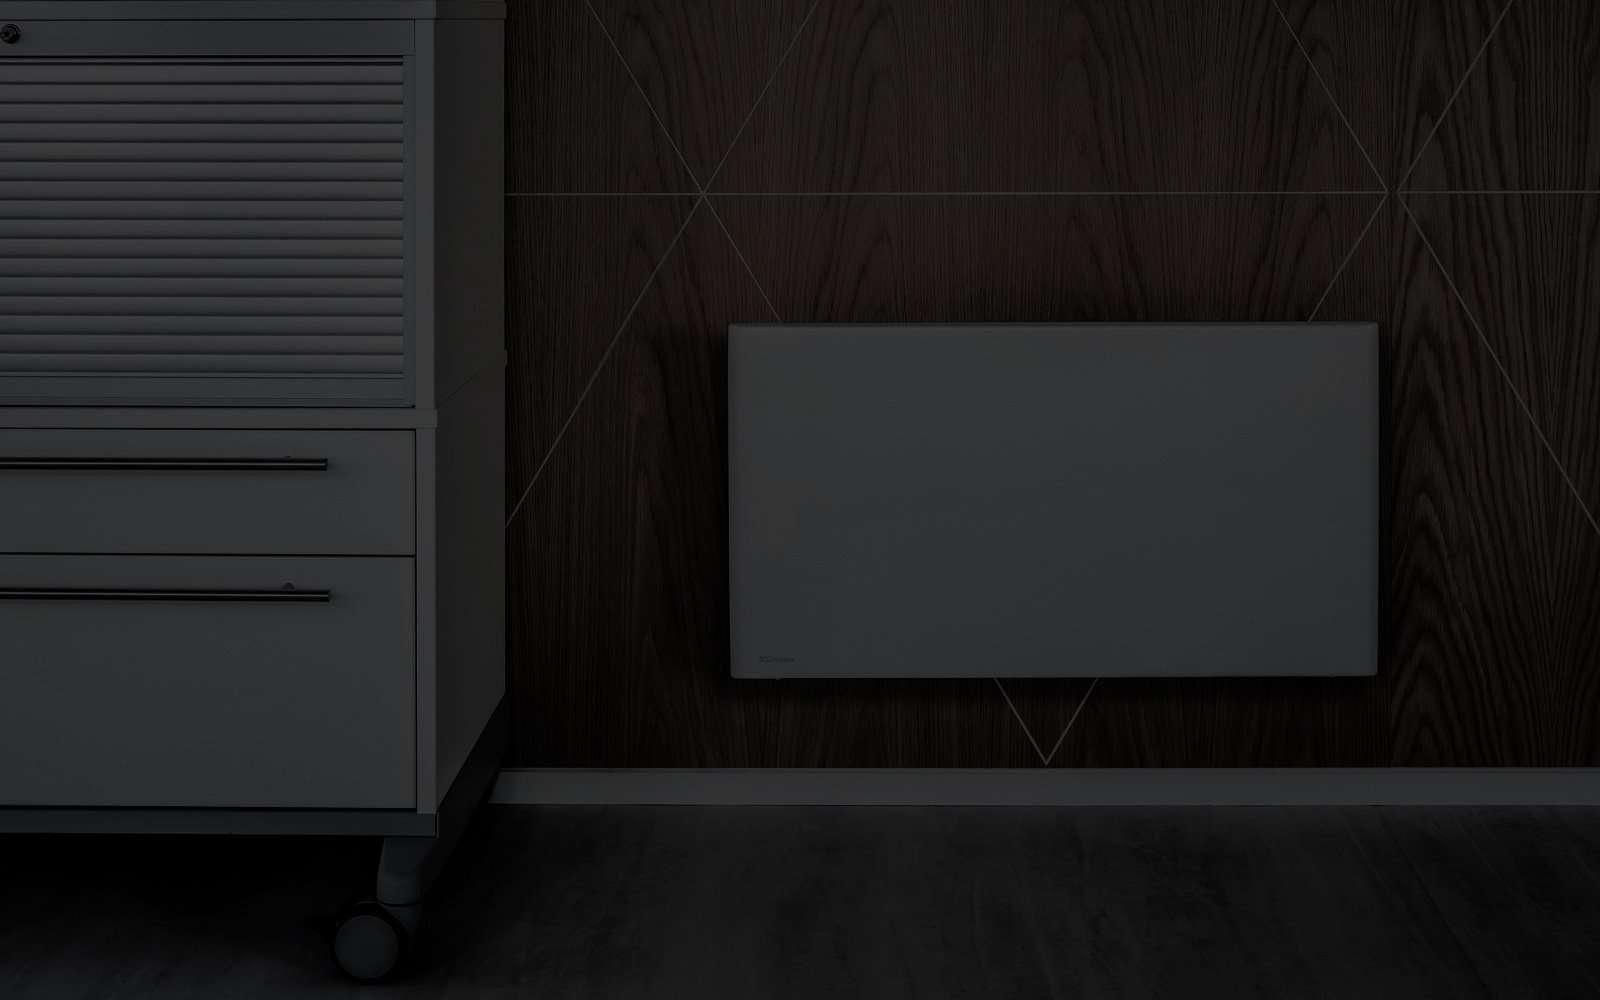 Dimplex kontor2 black riscaldamento elettrico norvegese for Dimplex radiatori elettrici